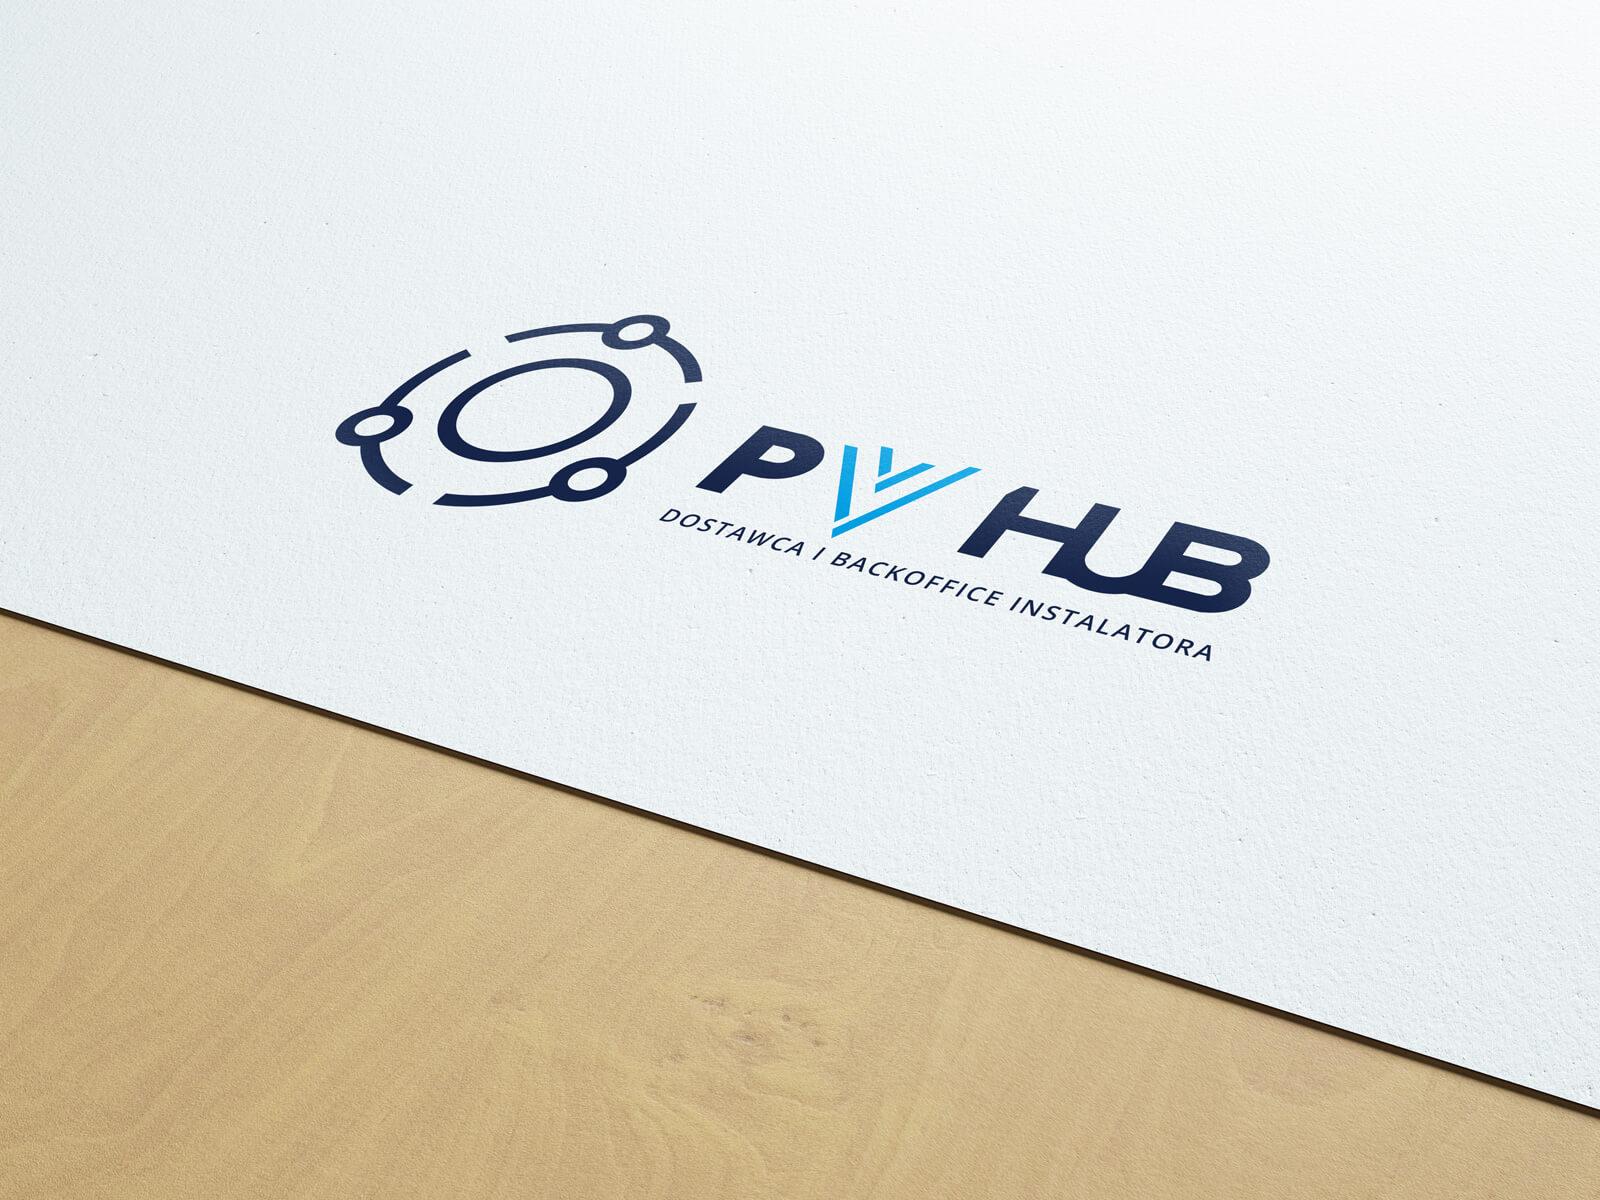 Projekt logo dla PVhub - dostawca i backoffice instalatora fotowoltaiki